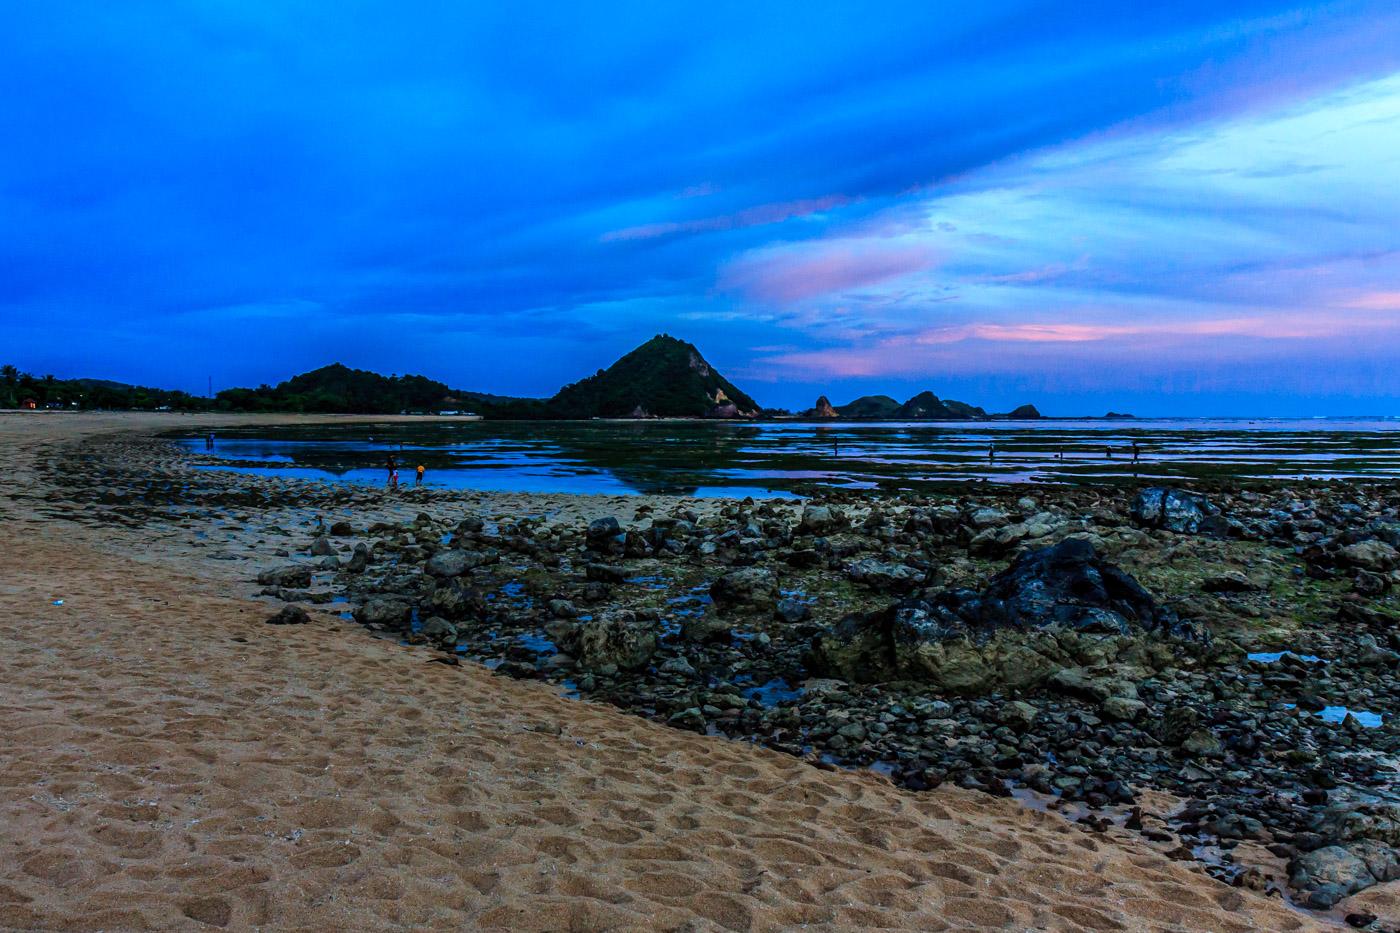 Blue clouds, low tide.